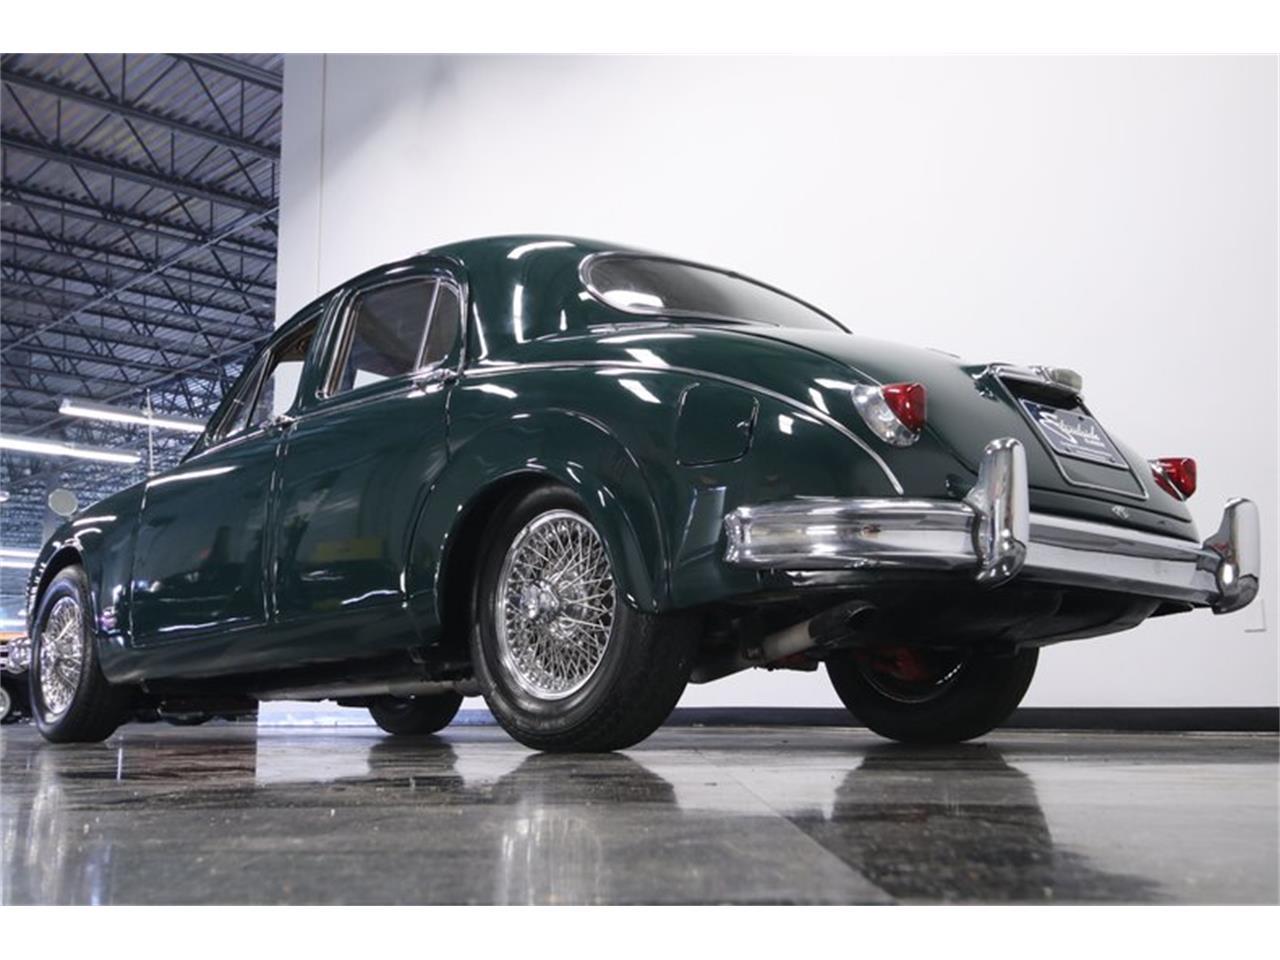 1957 Jaguar Mark I for Sale | ClassicCars.com | CC-1332136